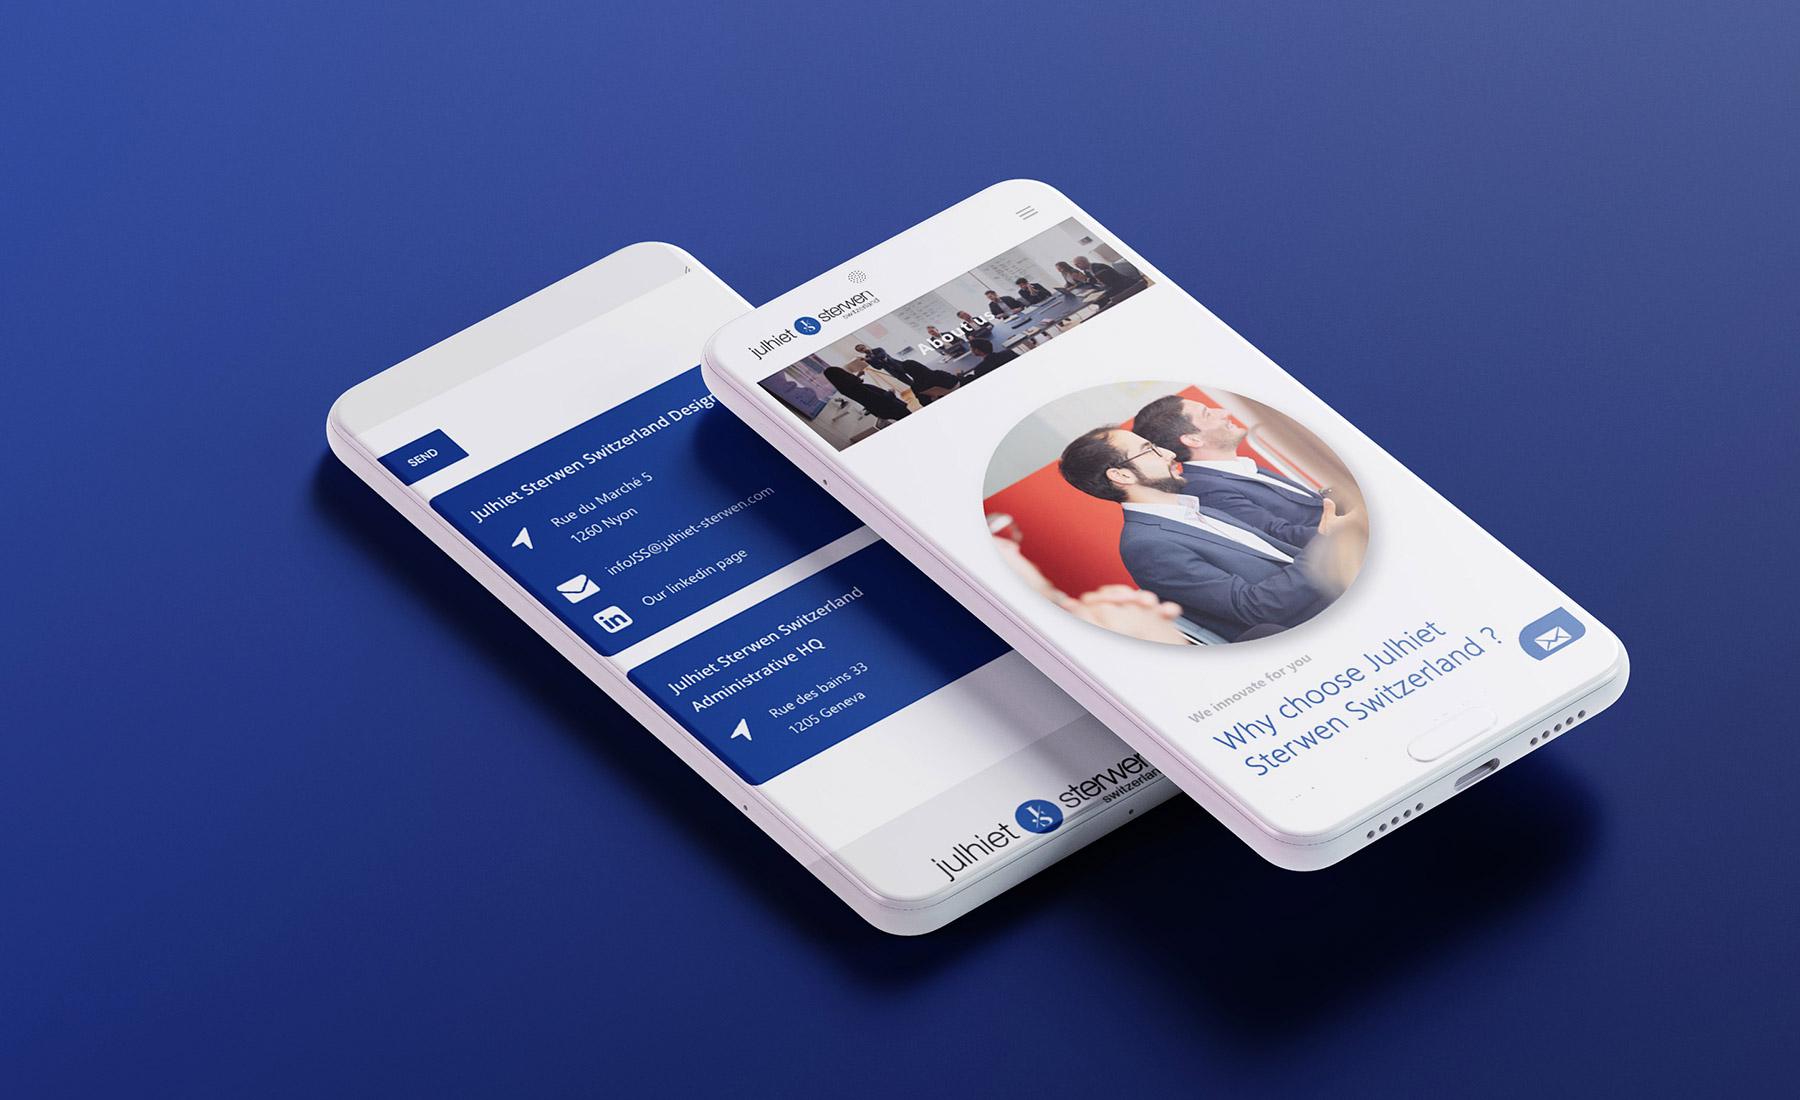 Mockup de site web de Julhiet Sterwen version smartphone